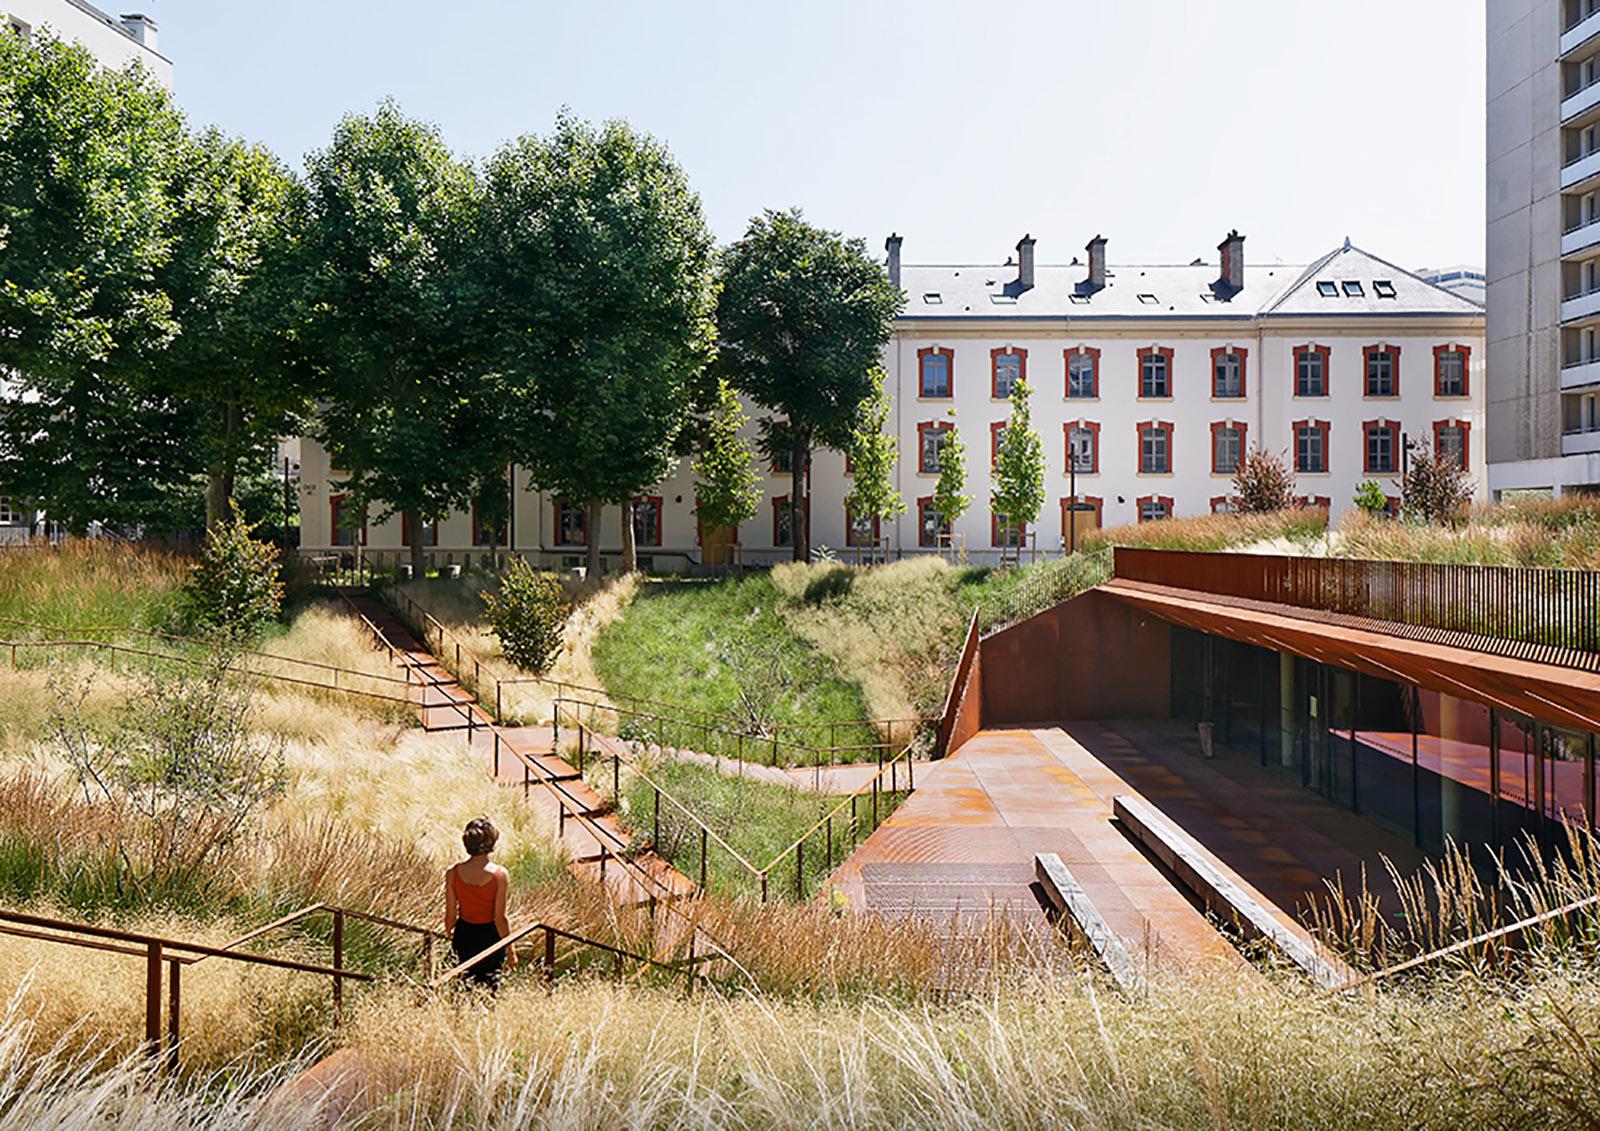 University of Law-Paris I, modernisation of the Lourcine Barracks in Paris, France by ChartierDalix